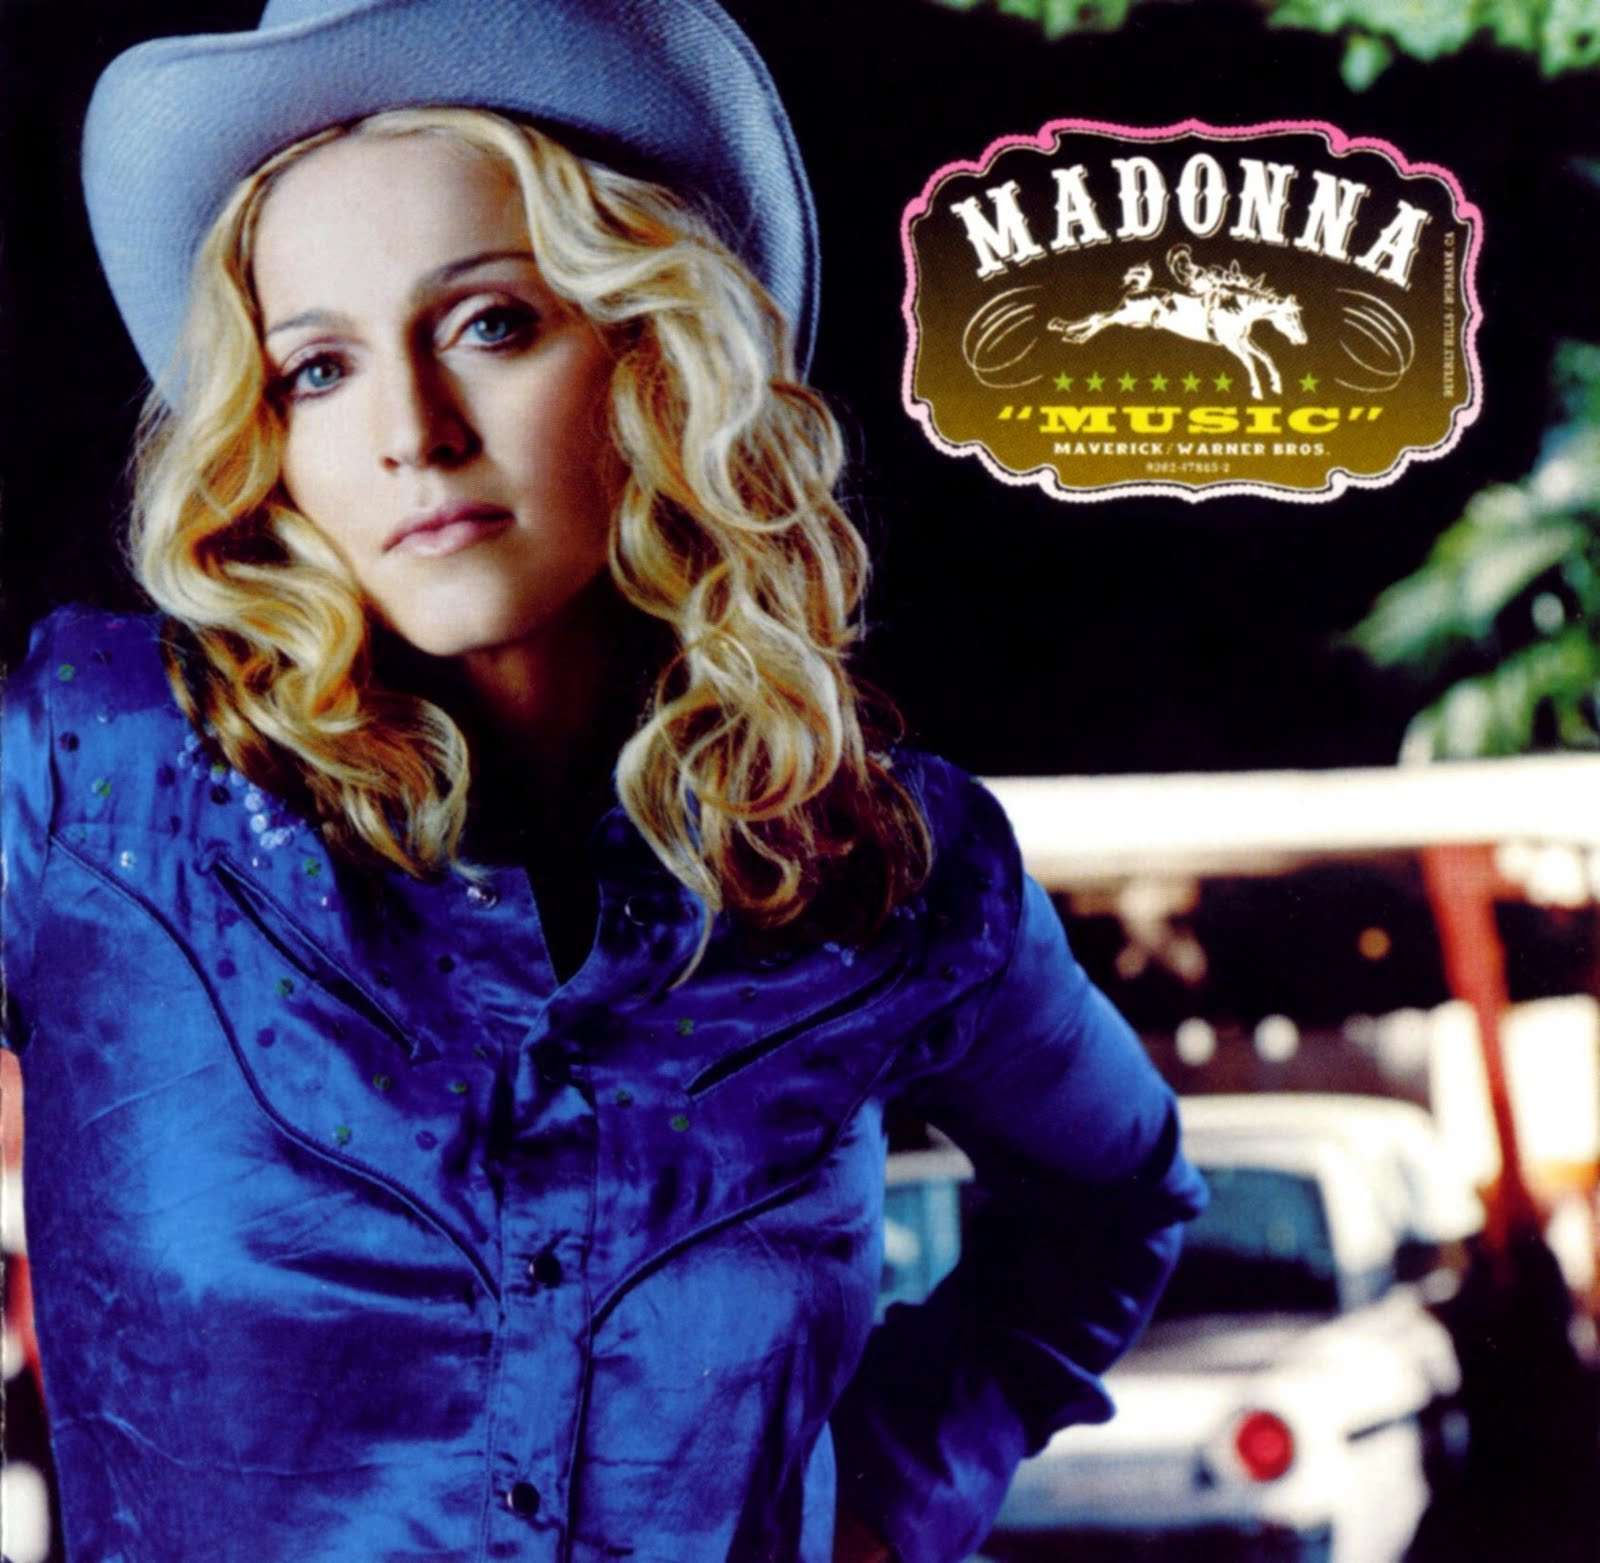 http://3.bp.blogspot.com/_f2iAGRf_Ioo/TIap2WpZn2I/AAAAAAAABUU/QjgYnpJ8a2c/s1600/Madonna+-+Music+%5BFront%5D.jpg